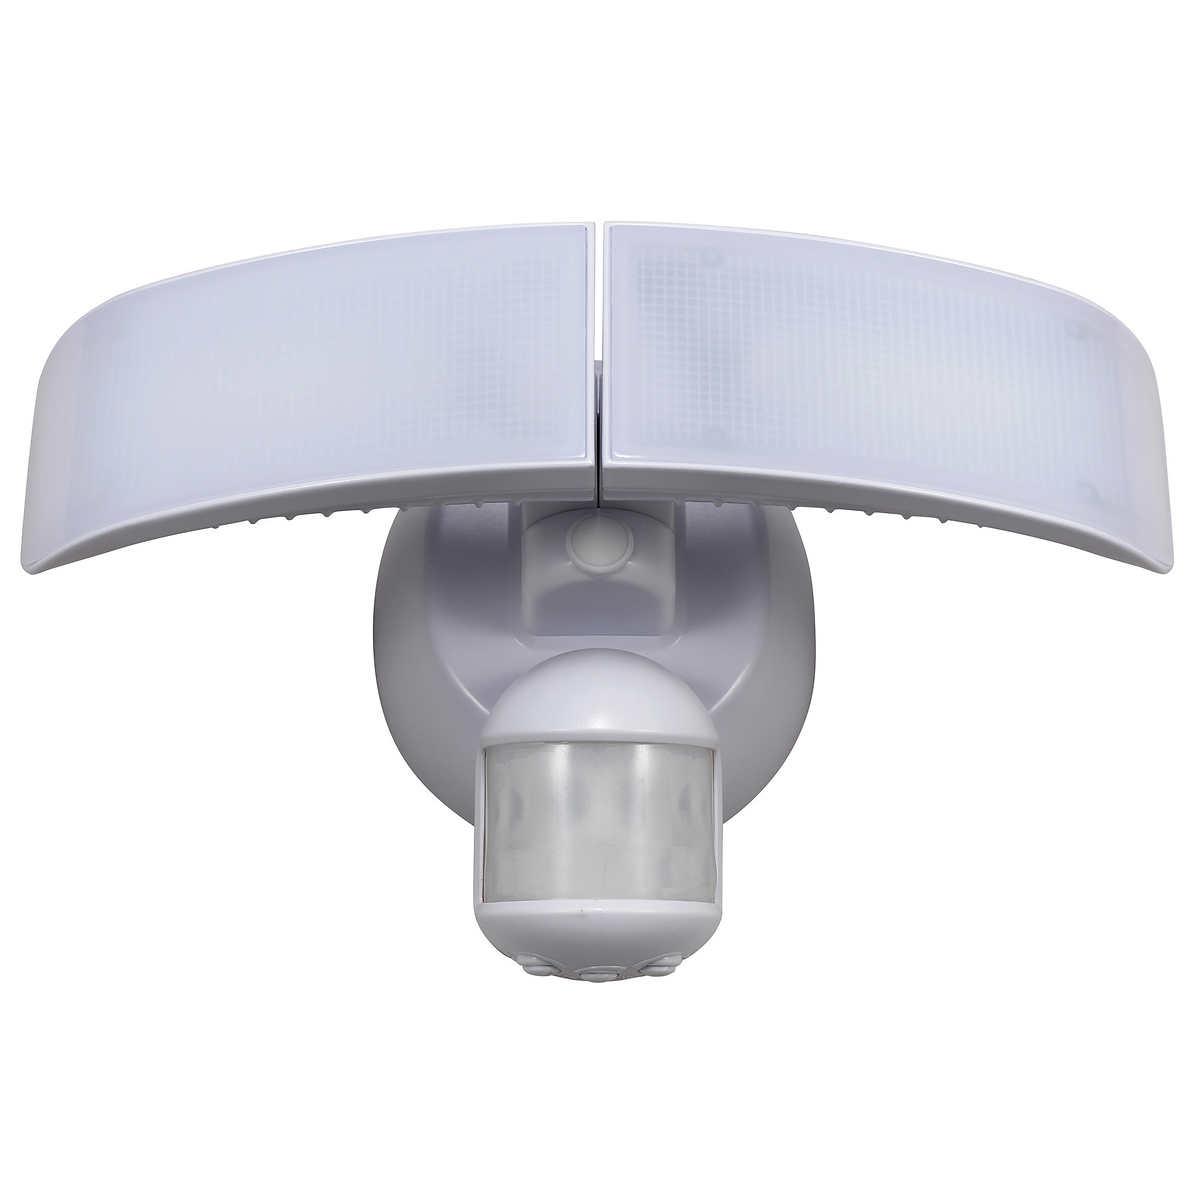 Home Zone LED Motion Sensor Security Light